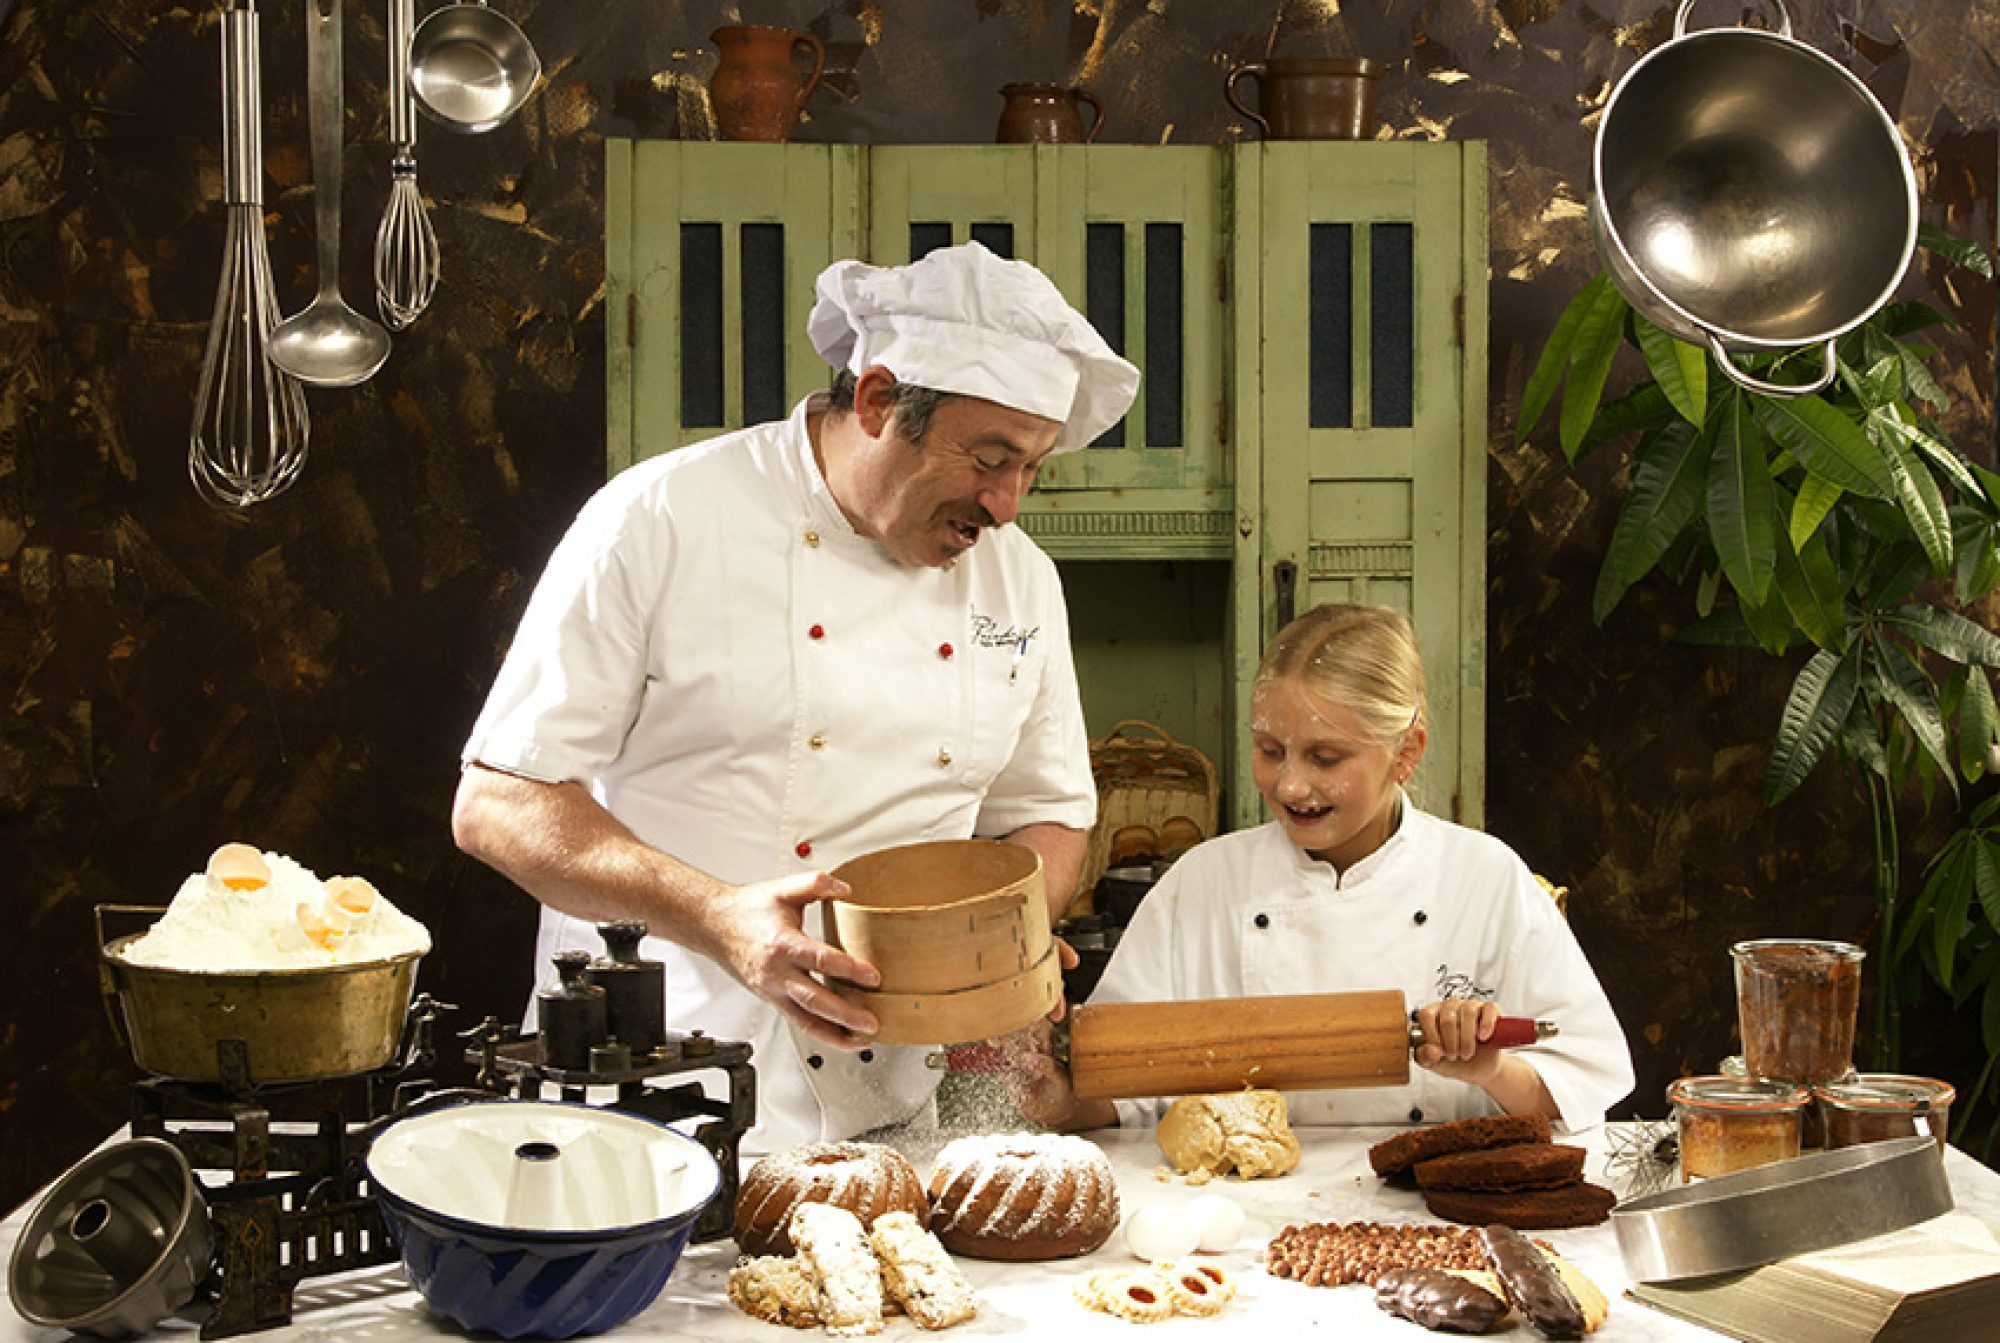 Sweetfactory - Die süße Manufaktur in Pfarrkirchen